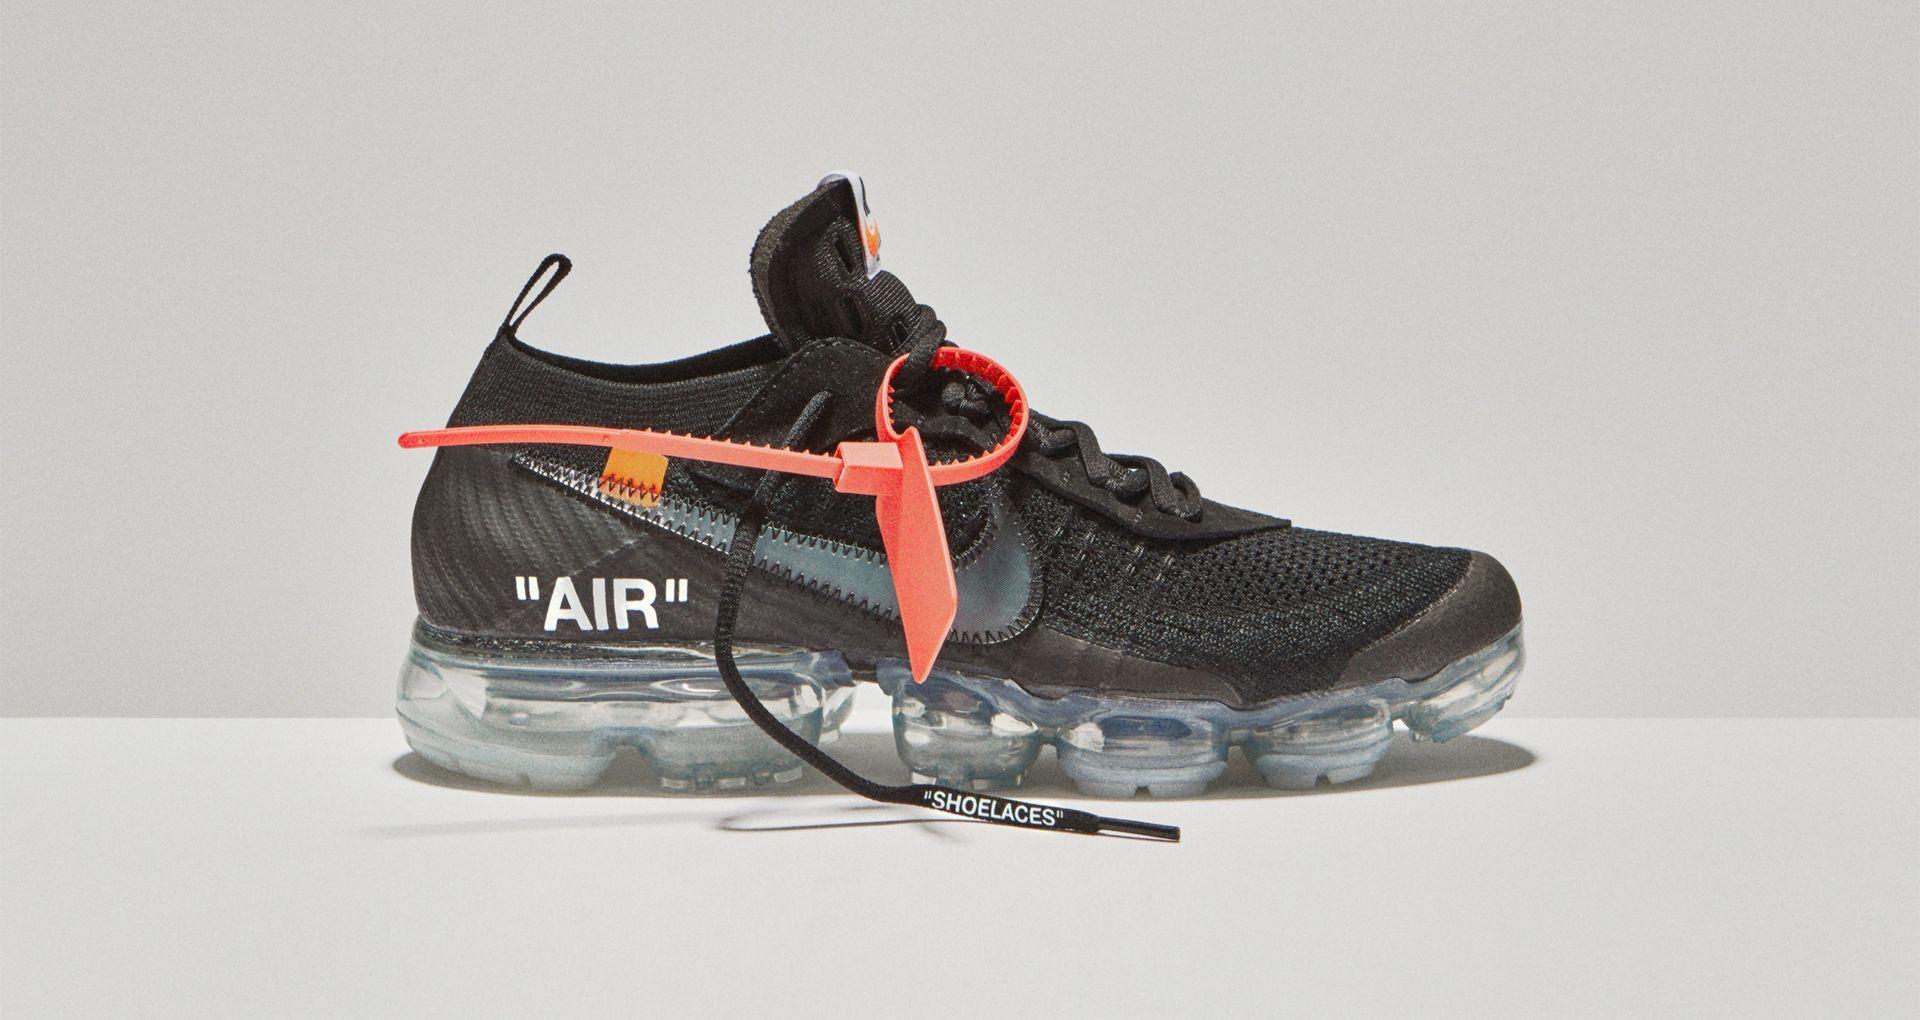 b195f14a60ec9 Nike The Ten Air Vapormax Off-White Black Release Date. Nike SNKRS ...